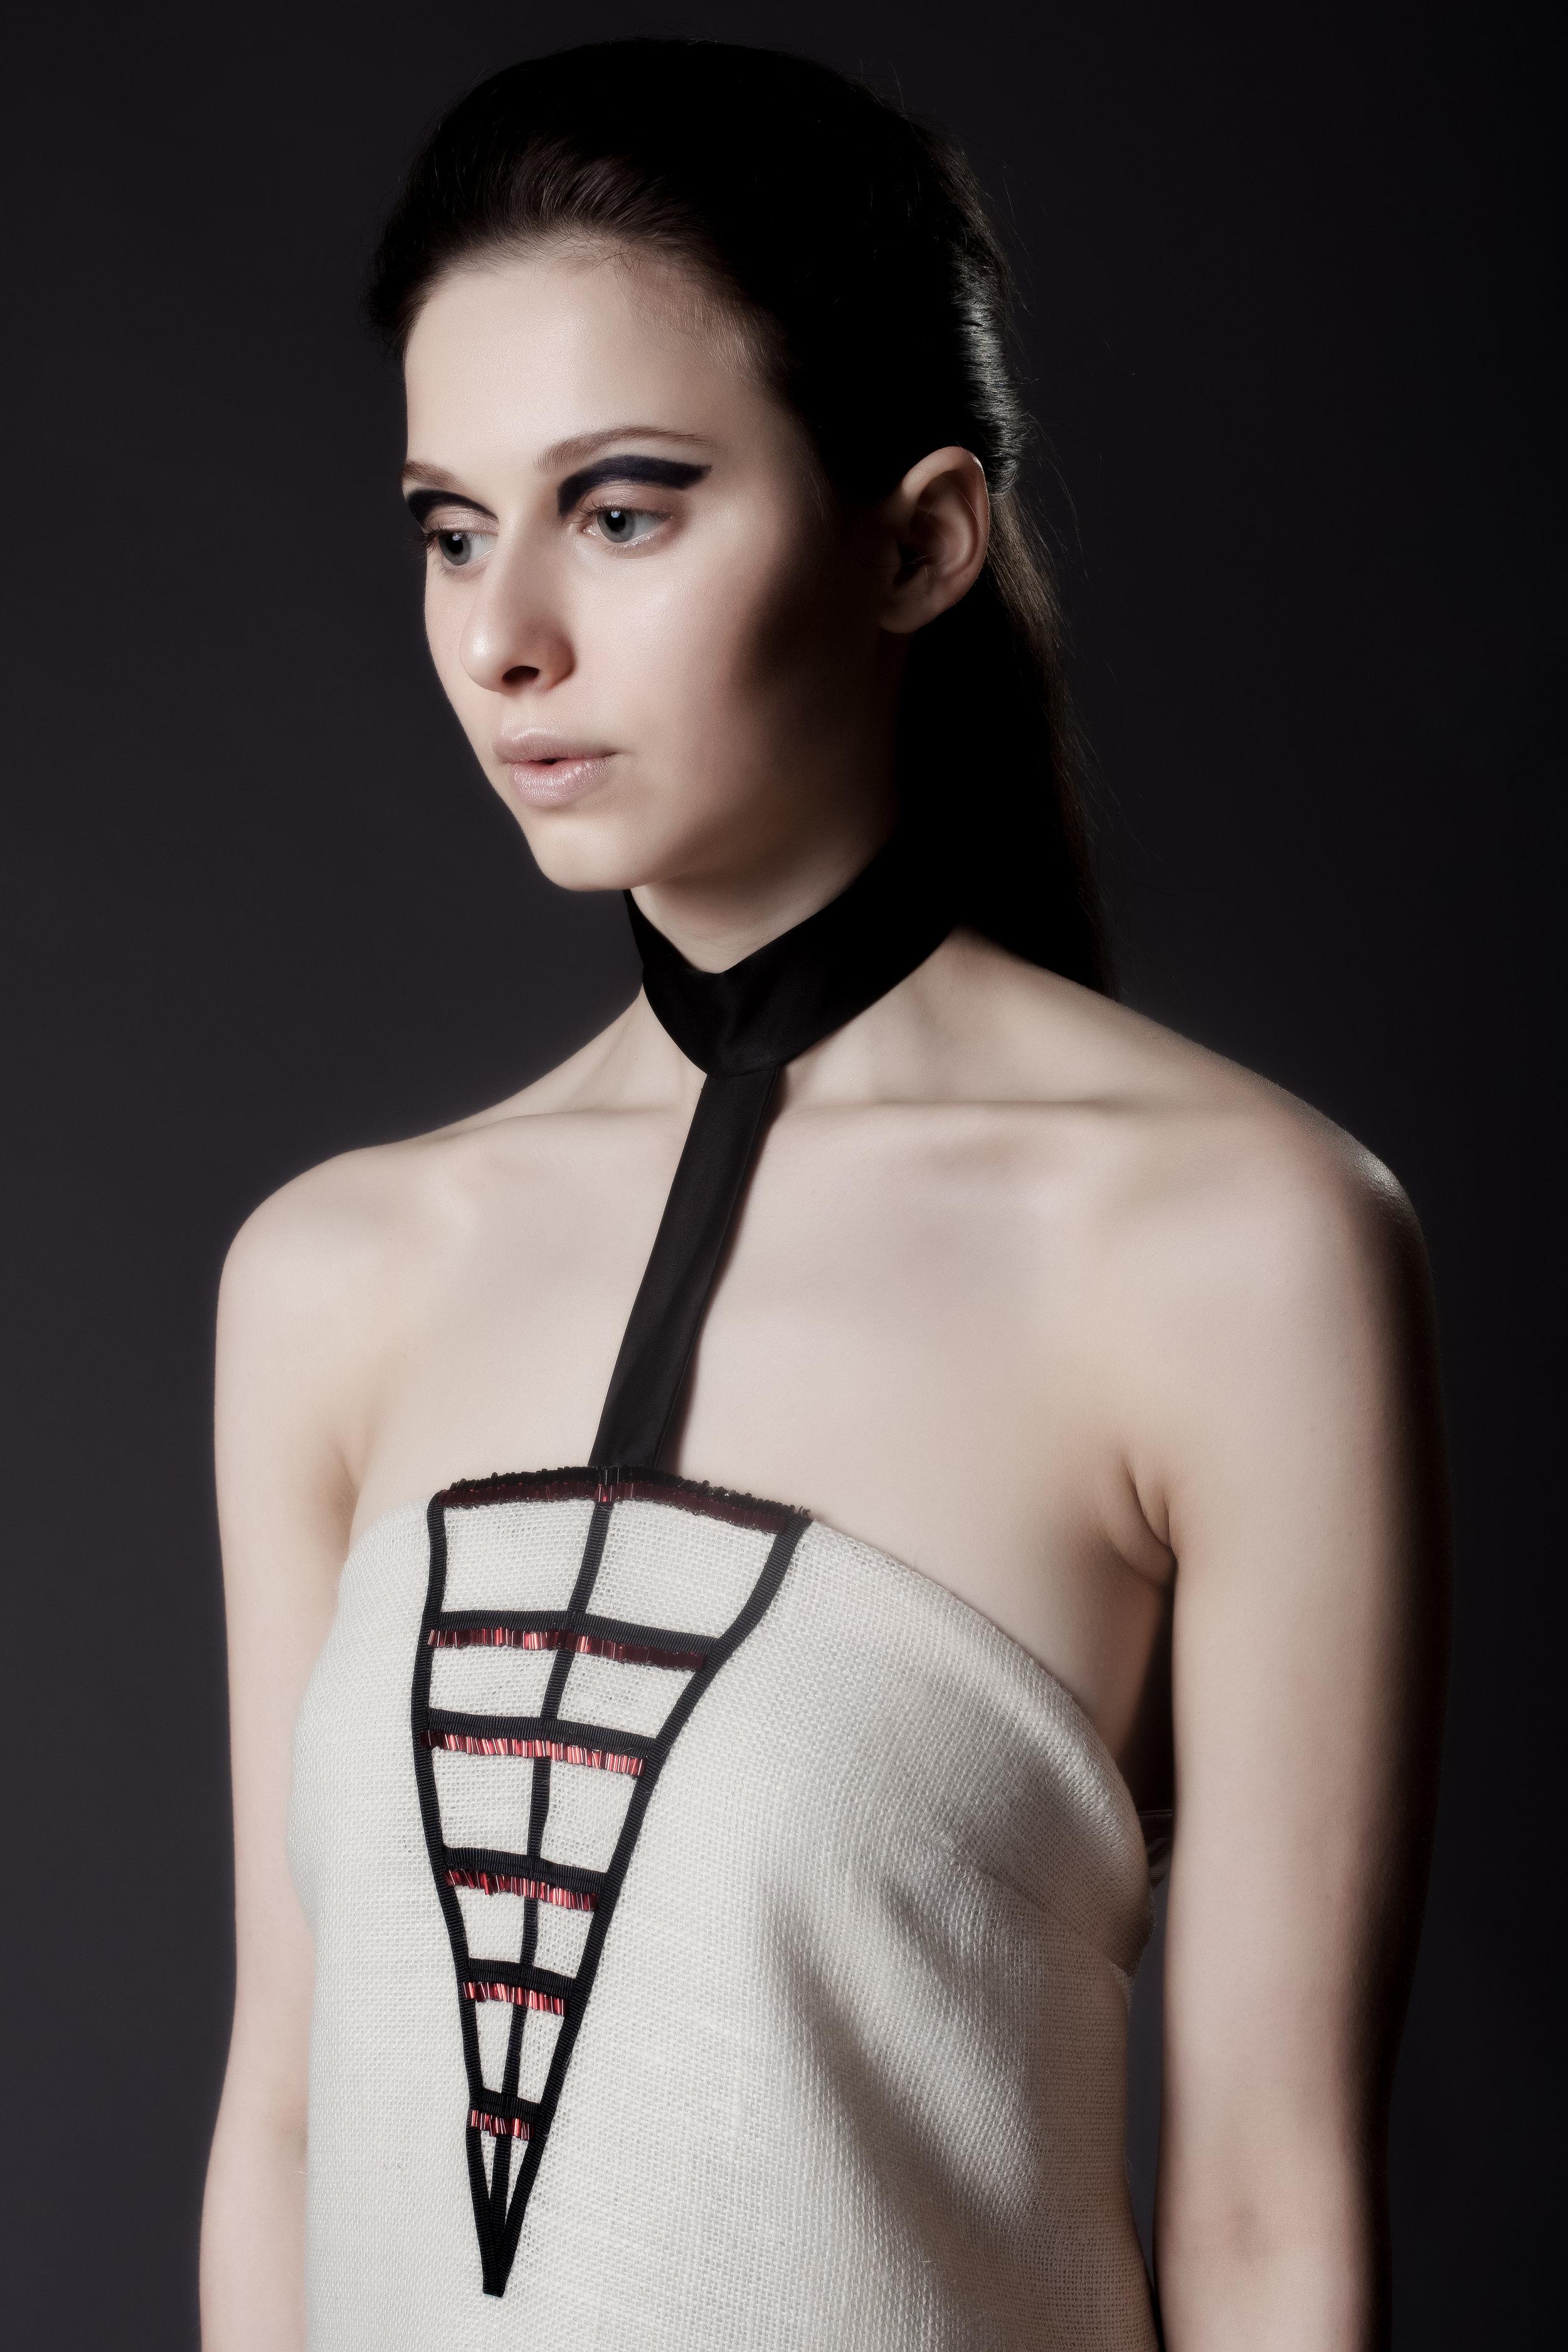 3L SAHA AW16 Chandelier Dress.jpg